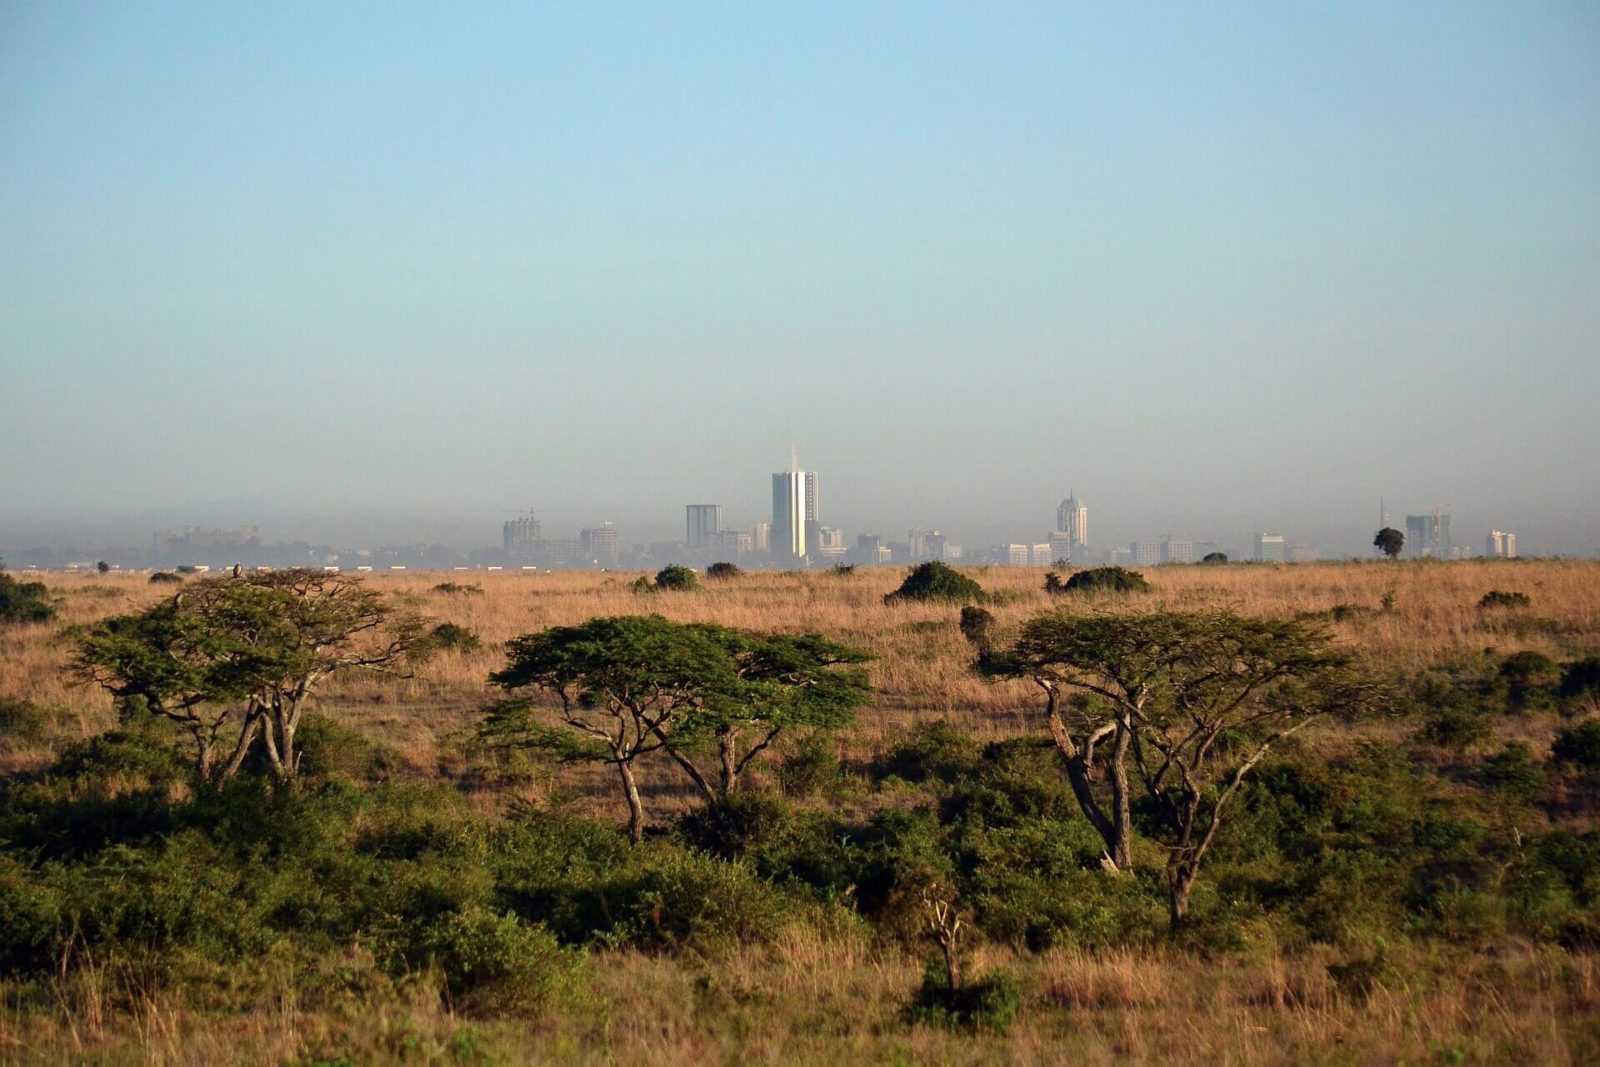 Kenya safari nairobi national_park_tours